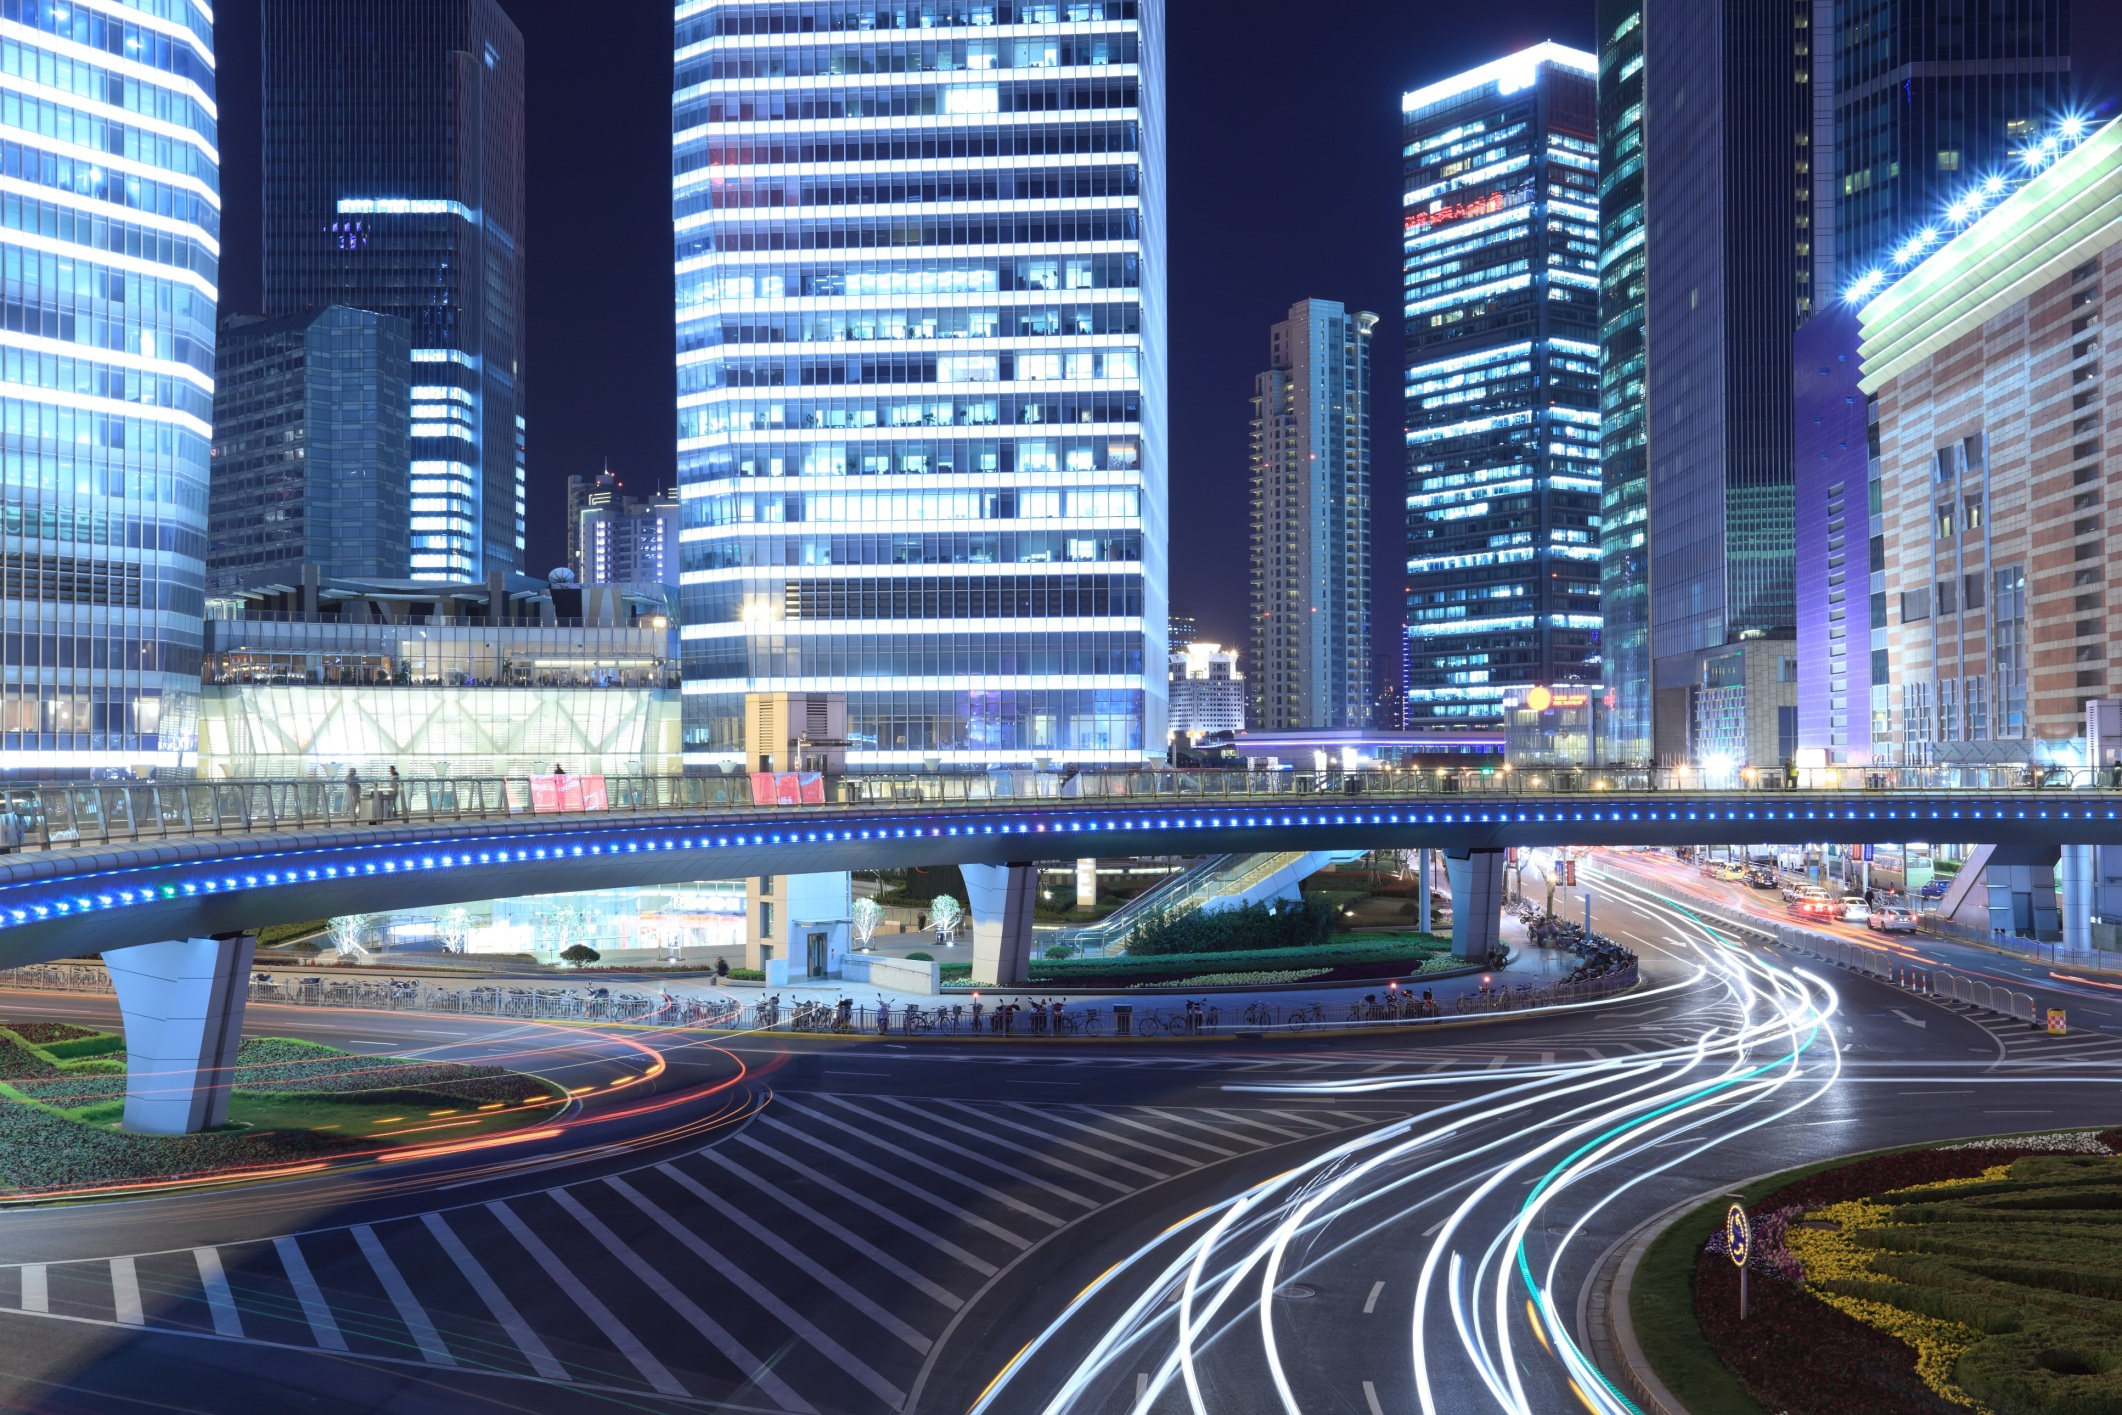 Москва и регионы представят тренды цифровизации городского хозяйства на конференции